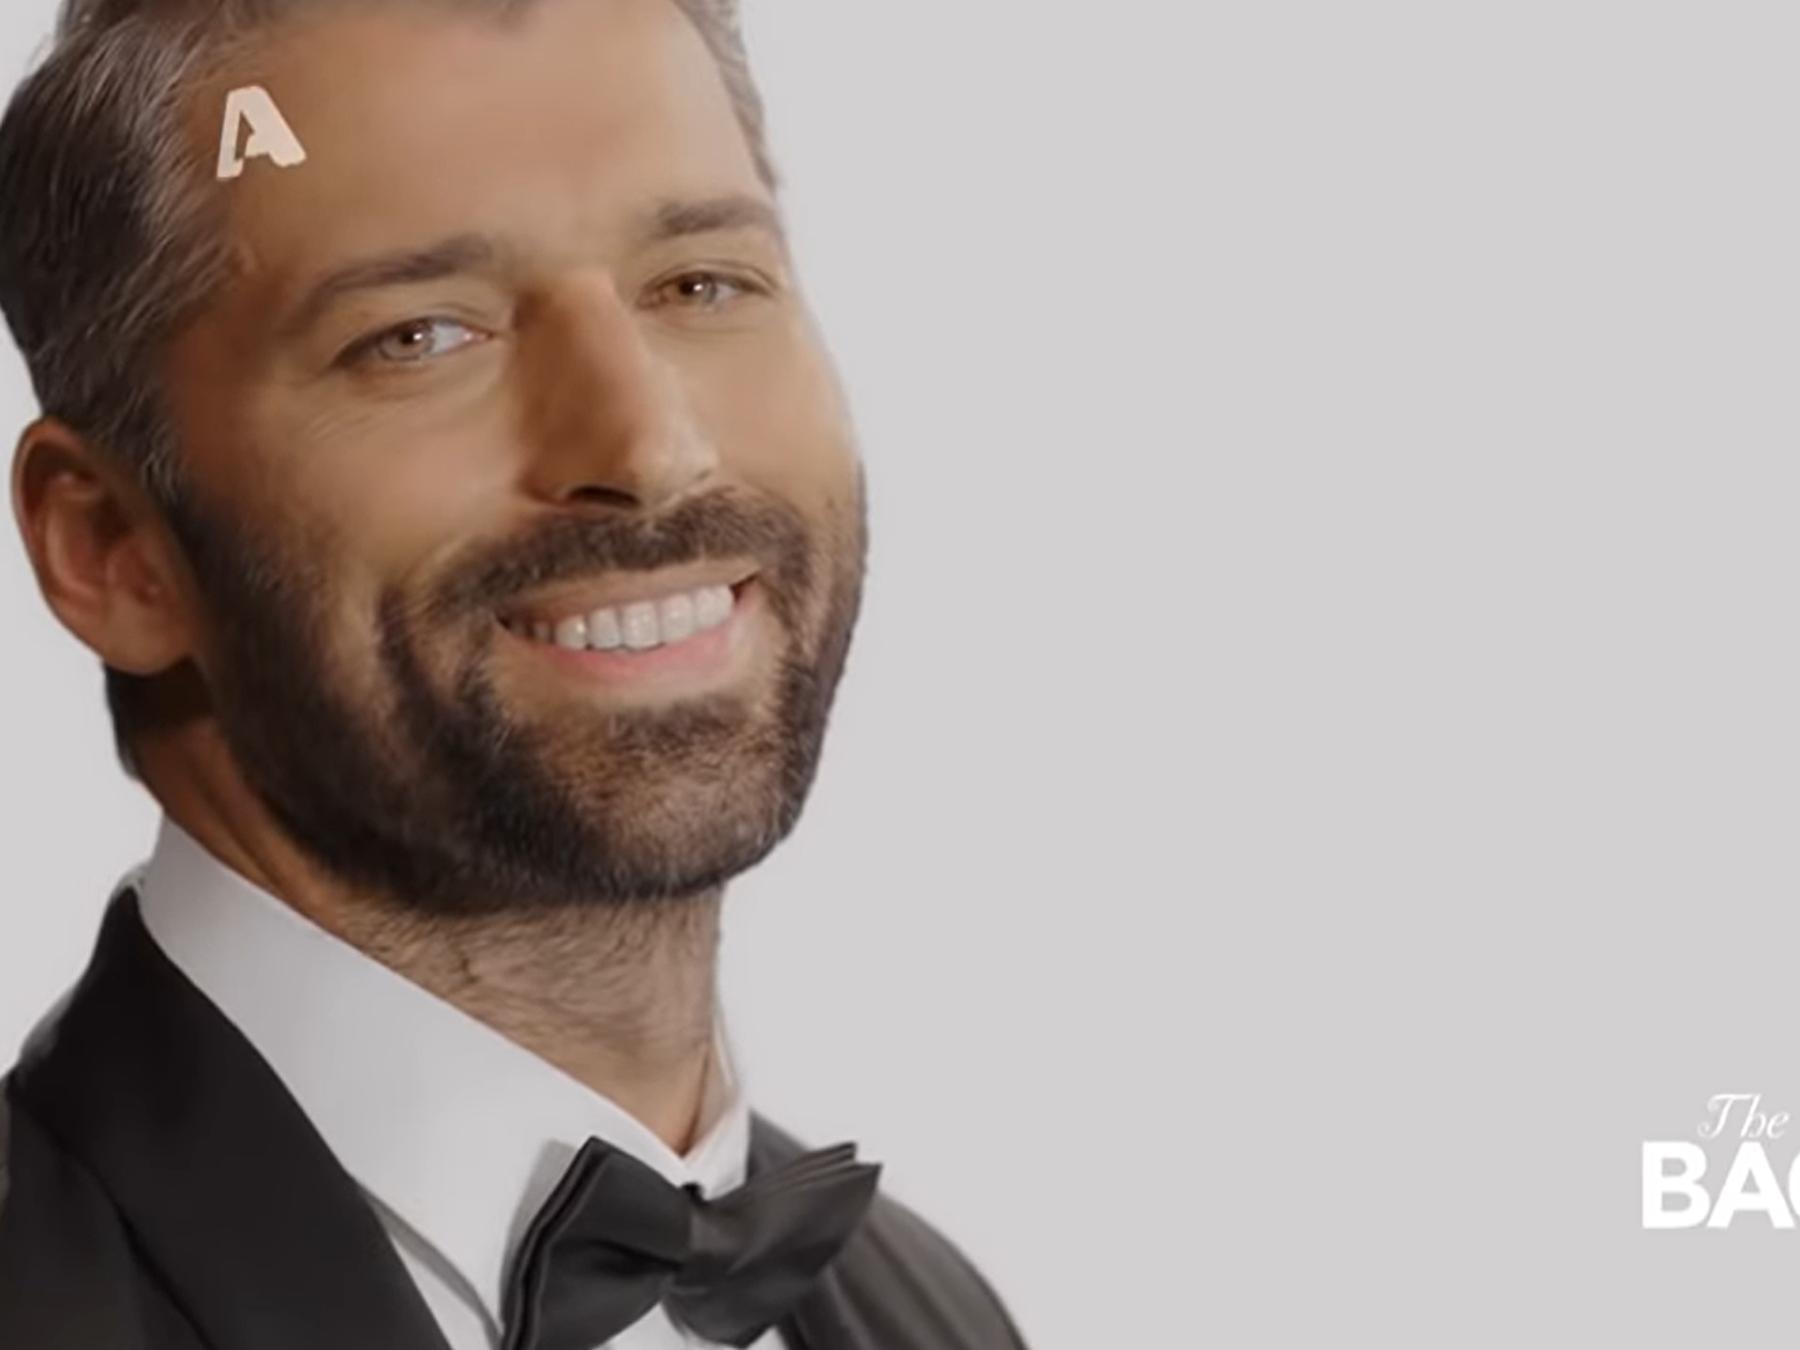 The Bachelor 2 - Αλέξης Παππάς: «Φυσικά και μπορούν να γεννηθούν αληθινά συναισθήματα μπροστά στις κάμερες»